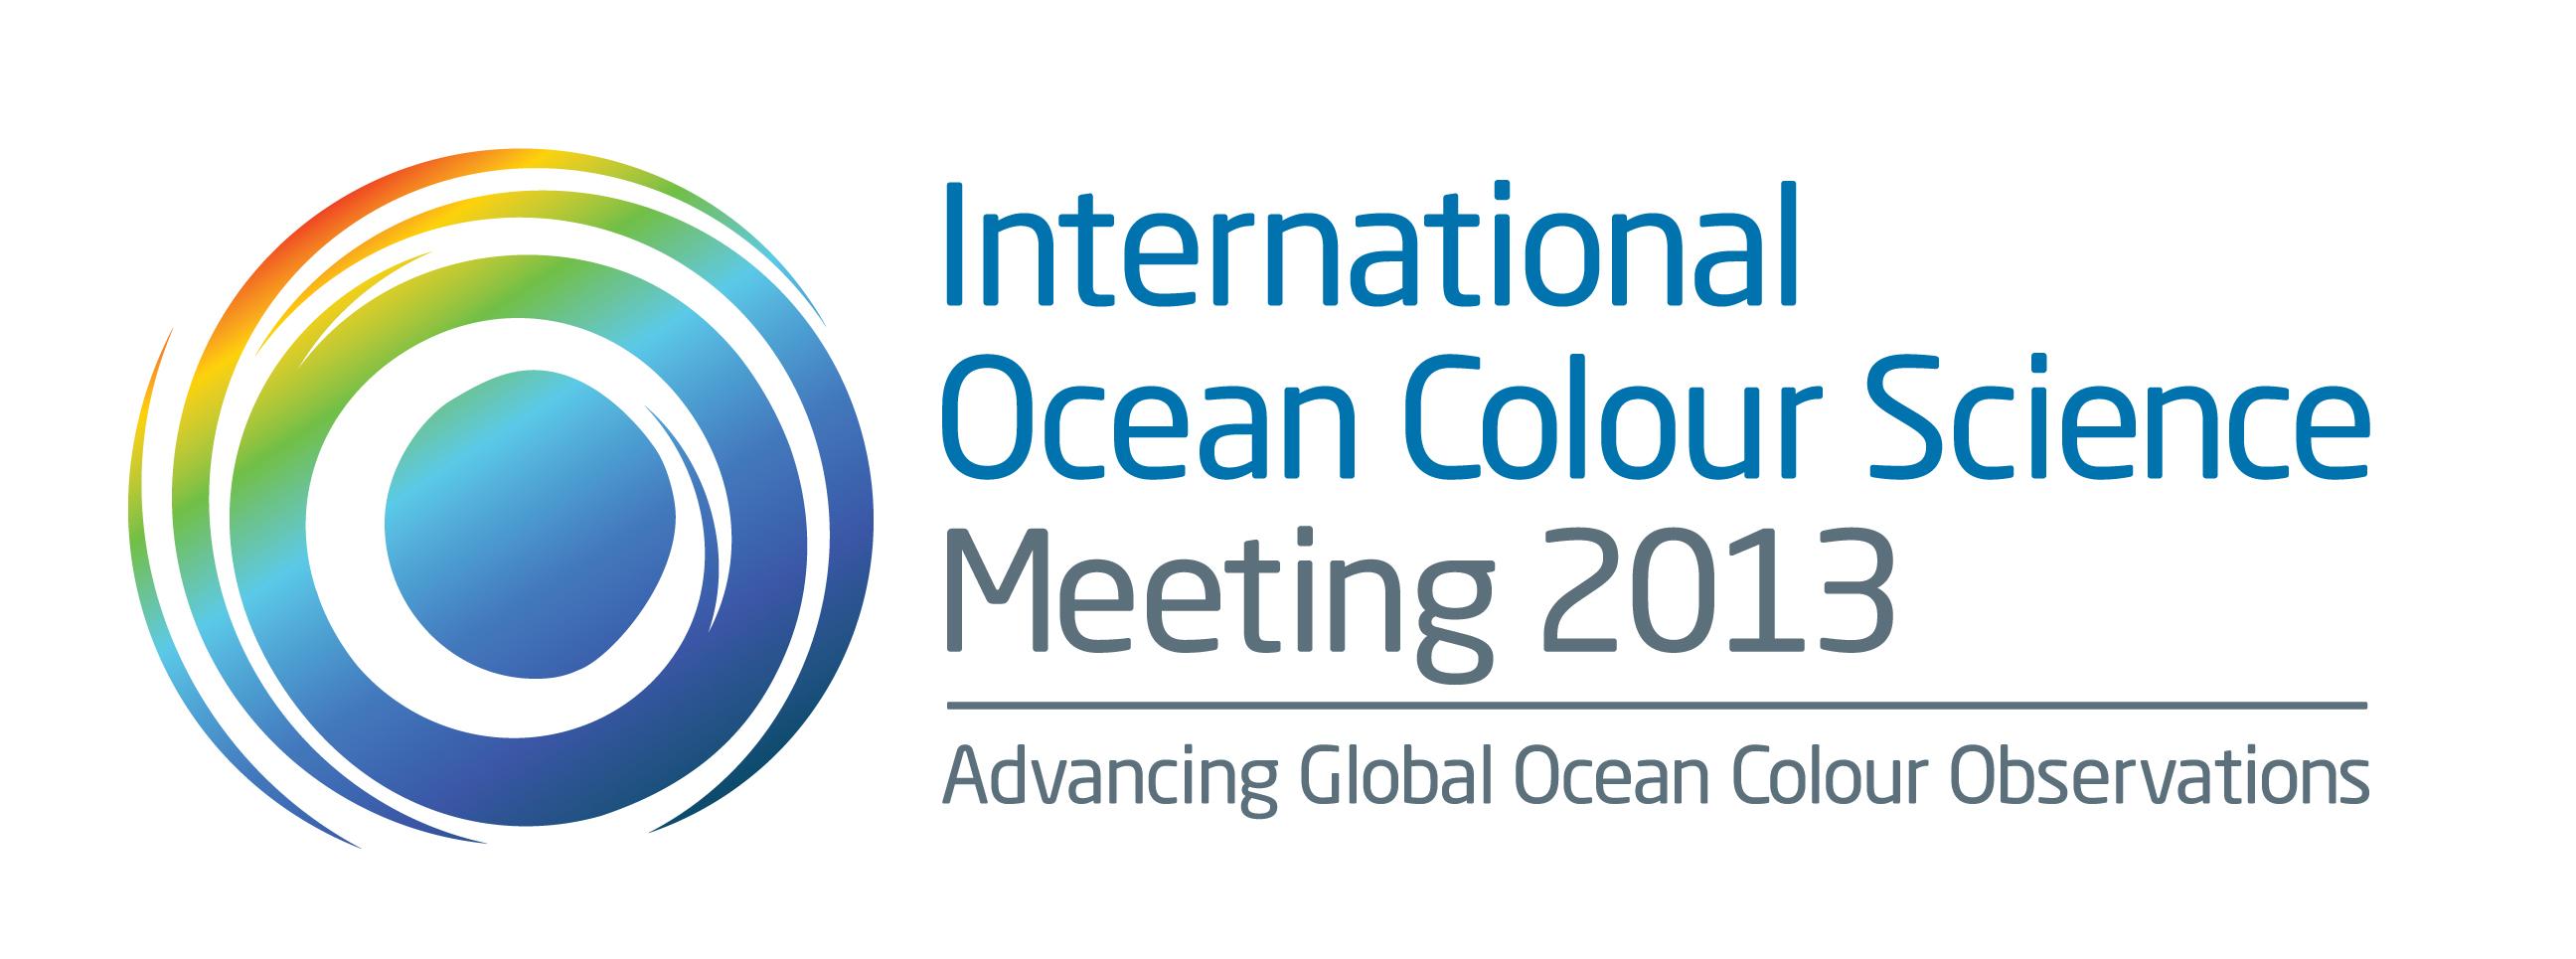 IOCS Meeting